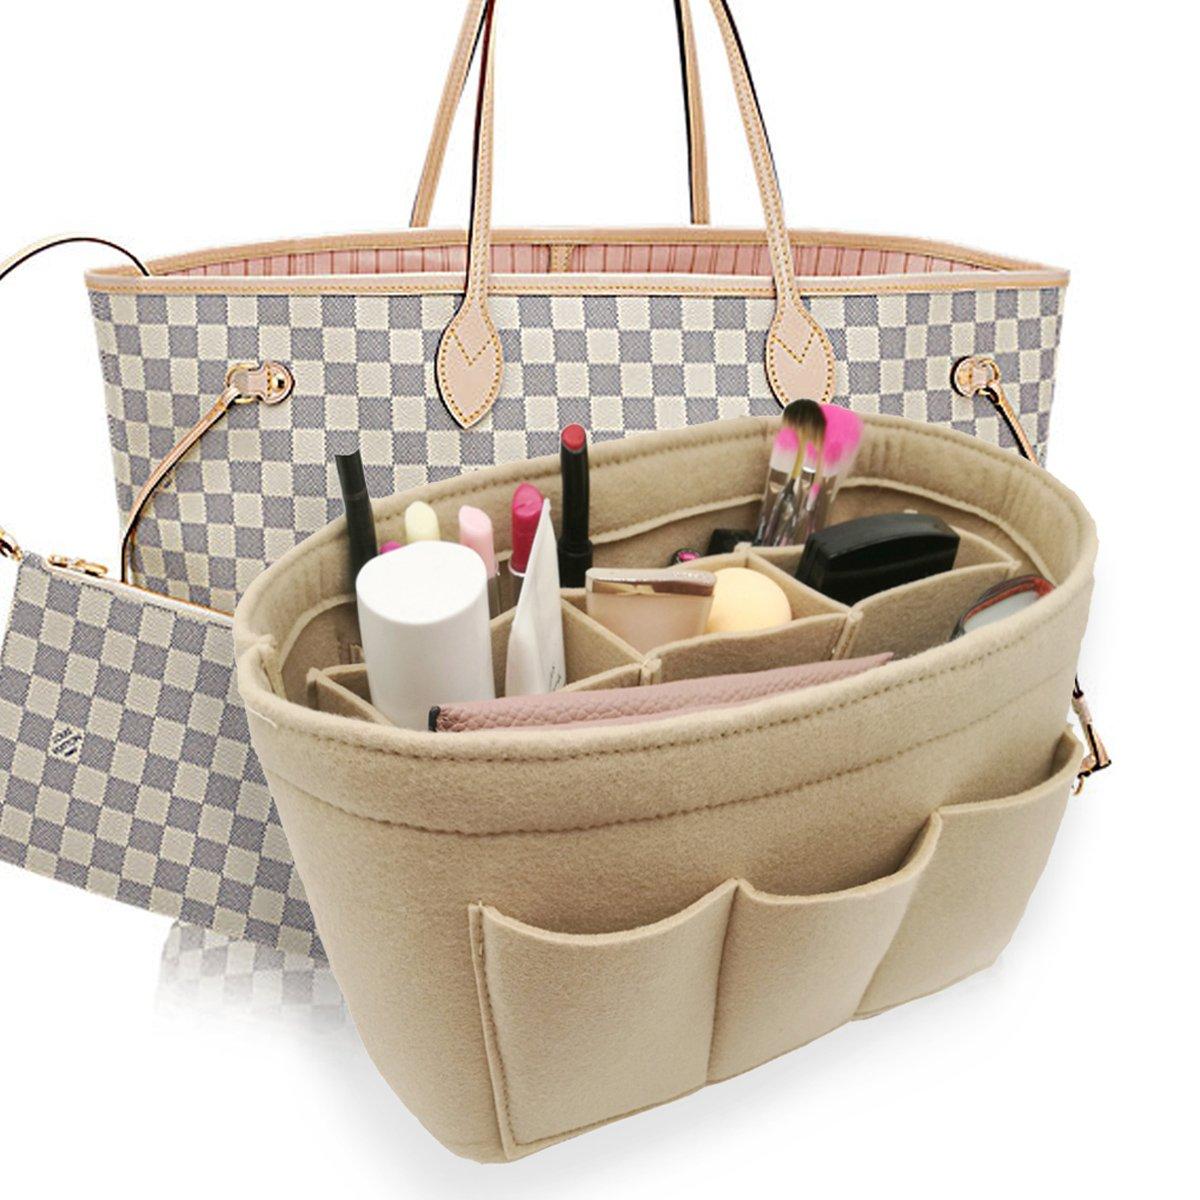 LEXSION Felt Handbag Organizer,Insert purse organizer Structure Shaper fits Speedy Beige M